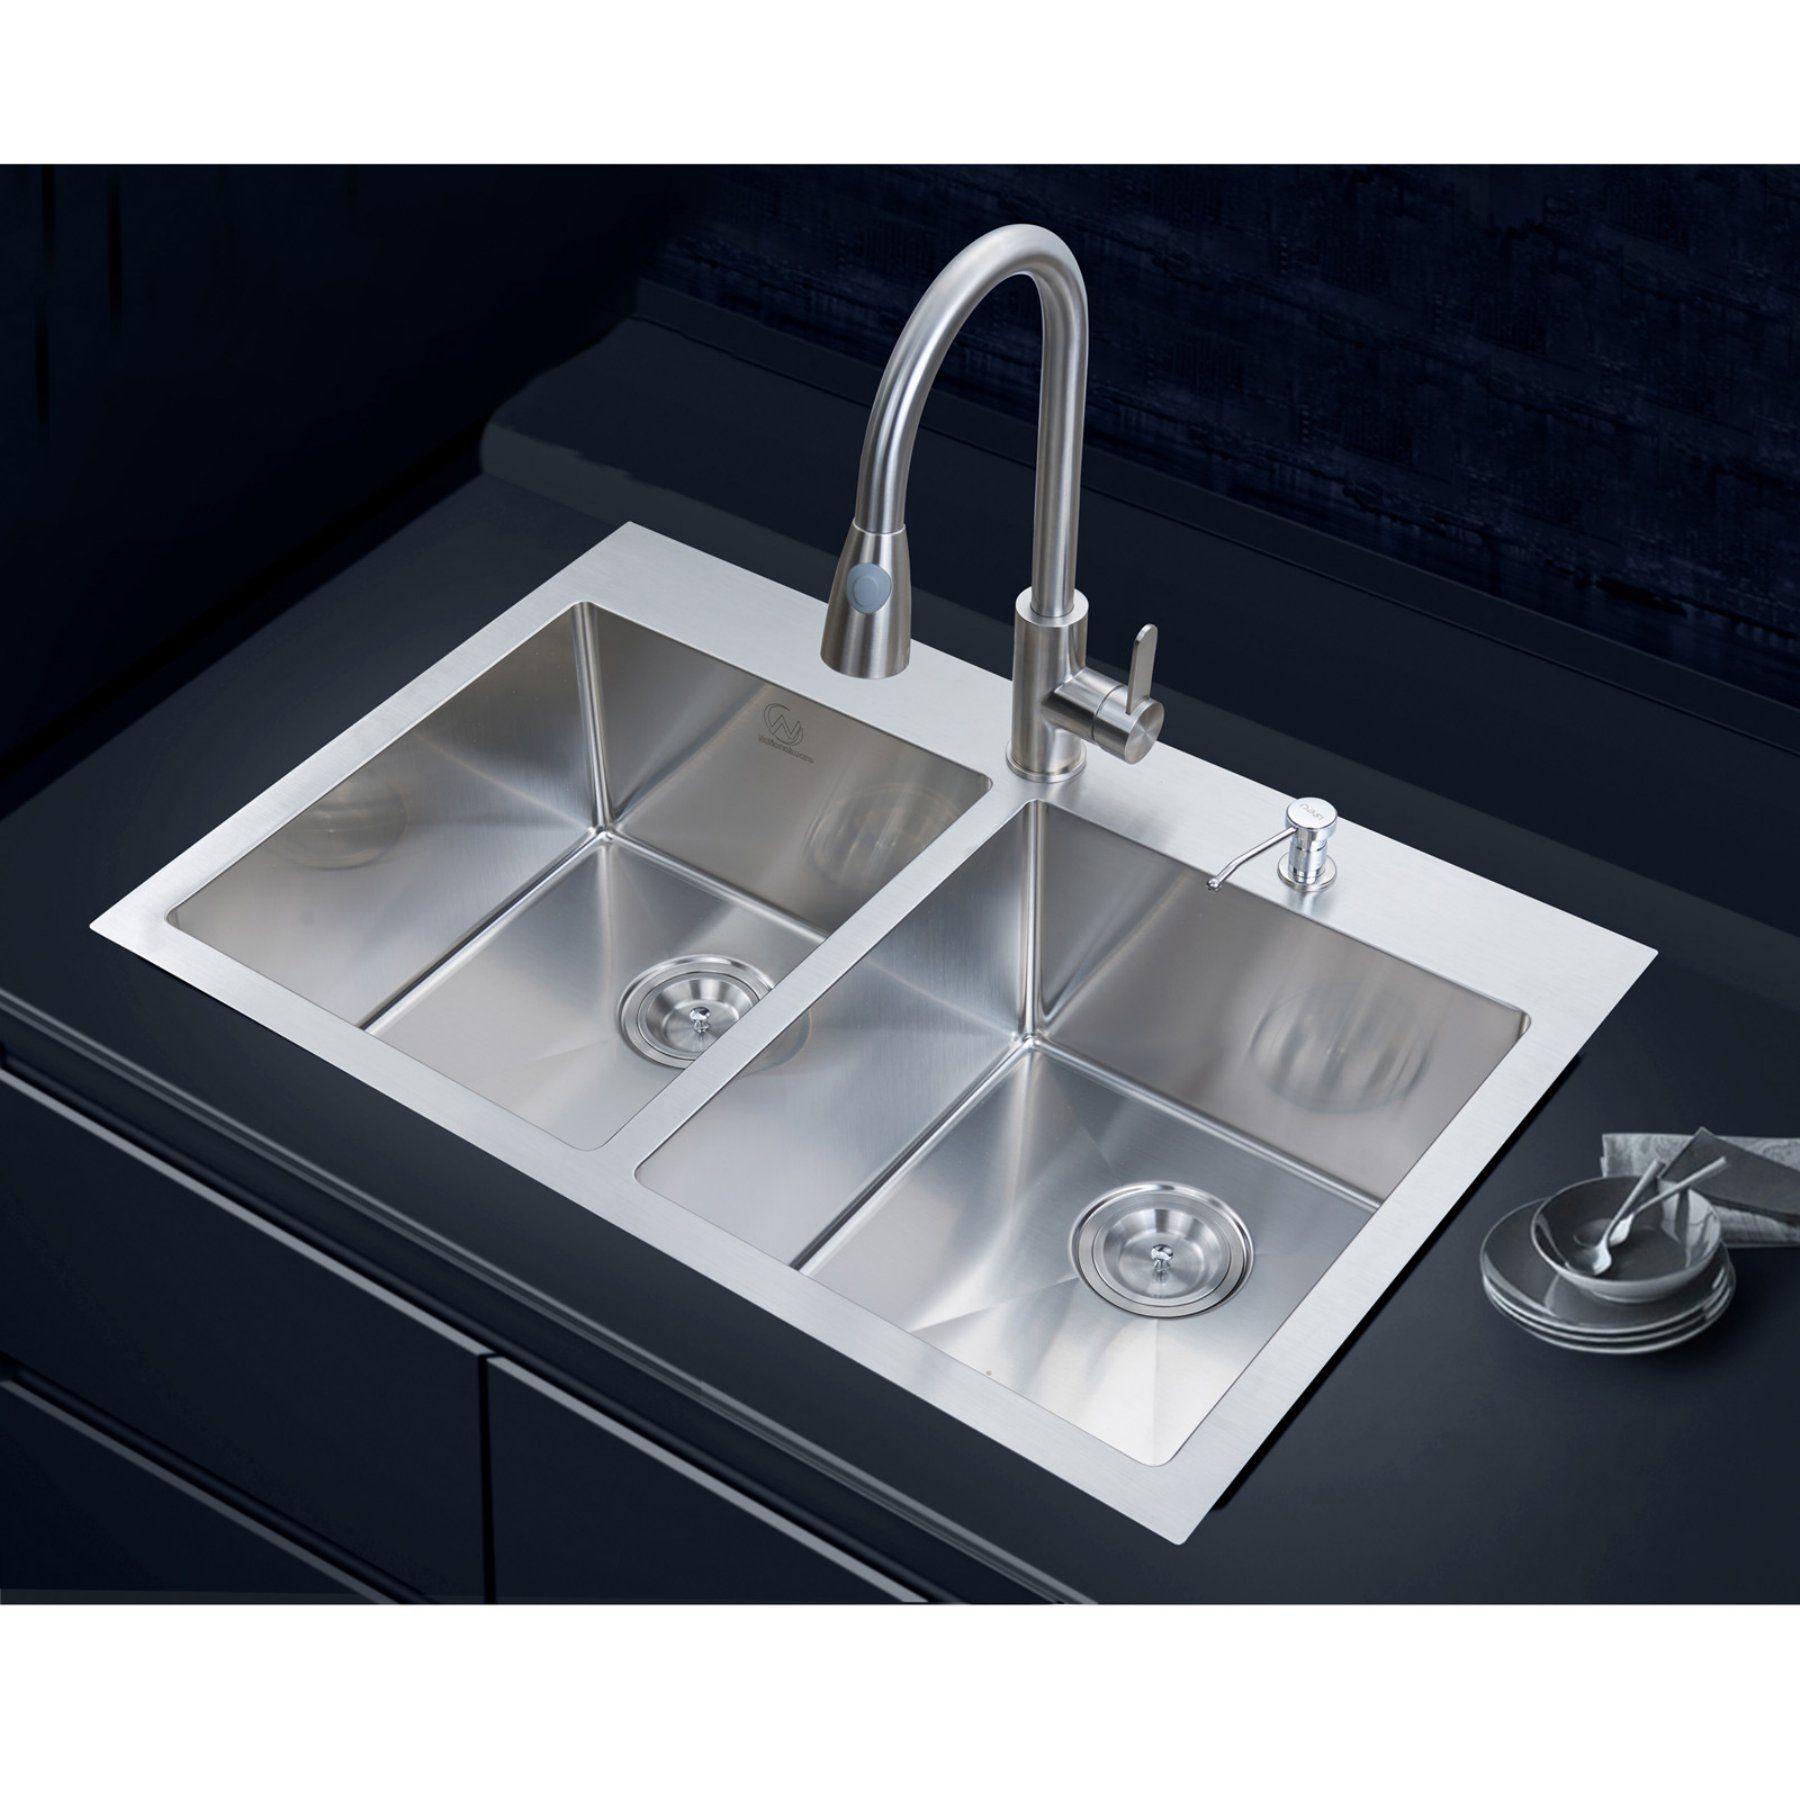 Stufurhome Nw 3322do Double Basin Overmount Kitchen Sink